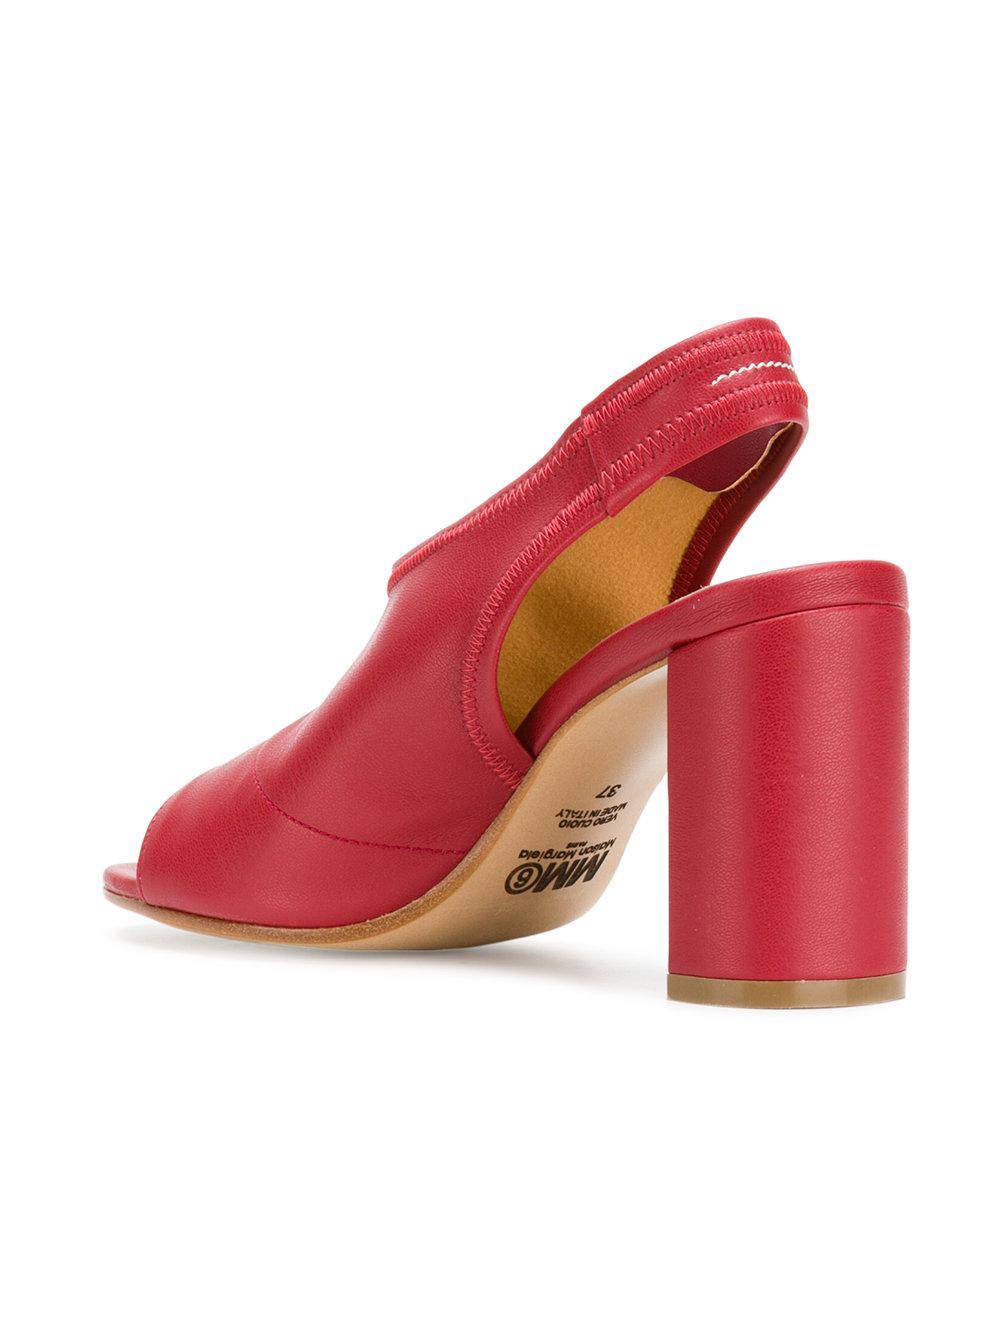 Mm6 Maison Margiela peep toe slingback sandals free shipping footaction TduMmyMVGO